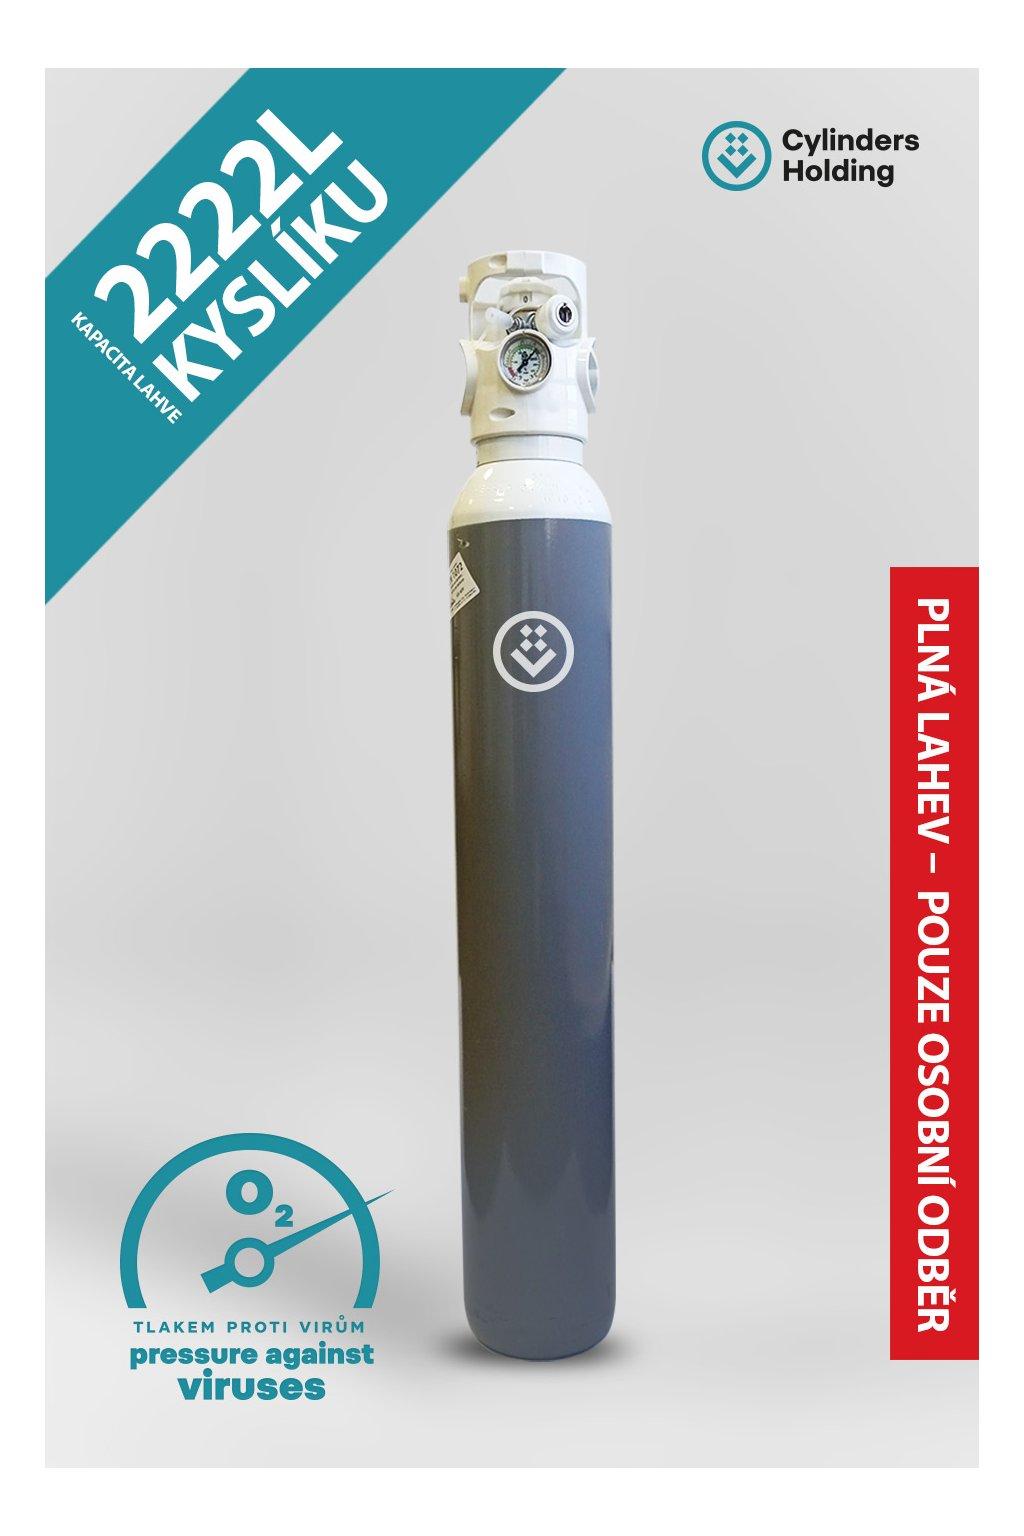 10L profilovka oxygen Cavagna